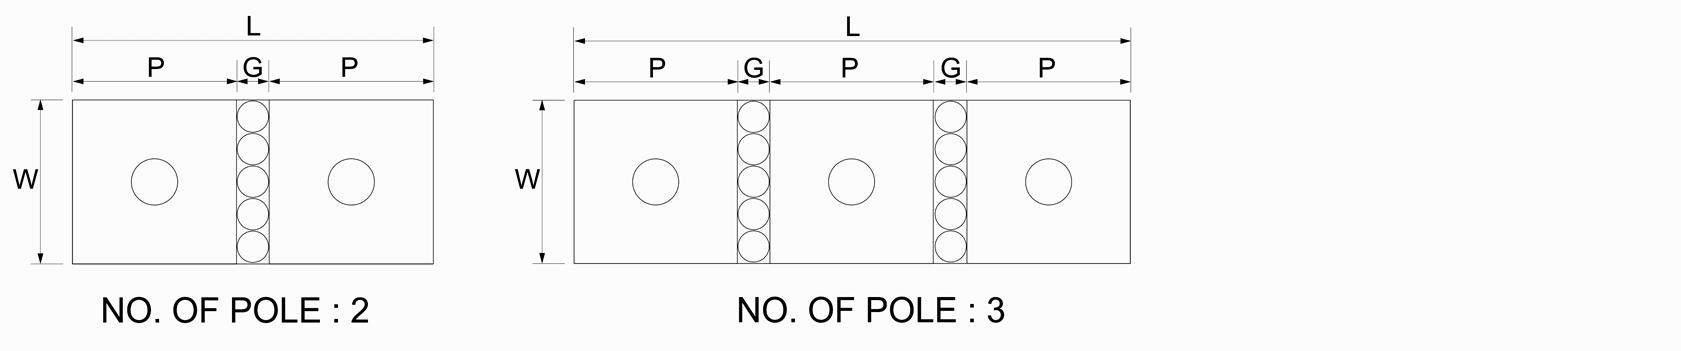 proimages/products/product-01/EEPM/EEPM-A/IB02.jpg